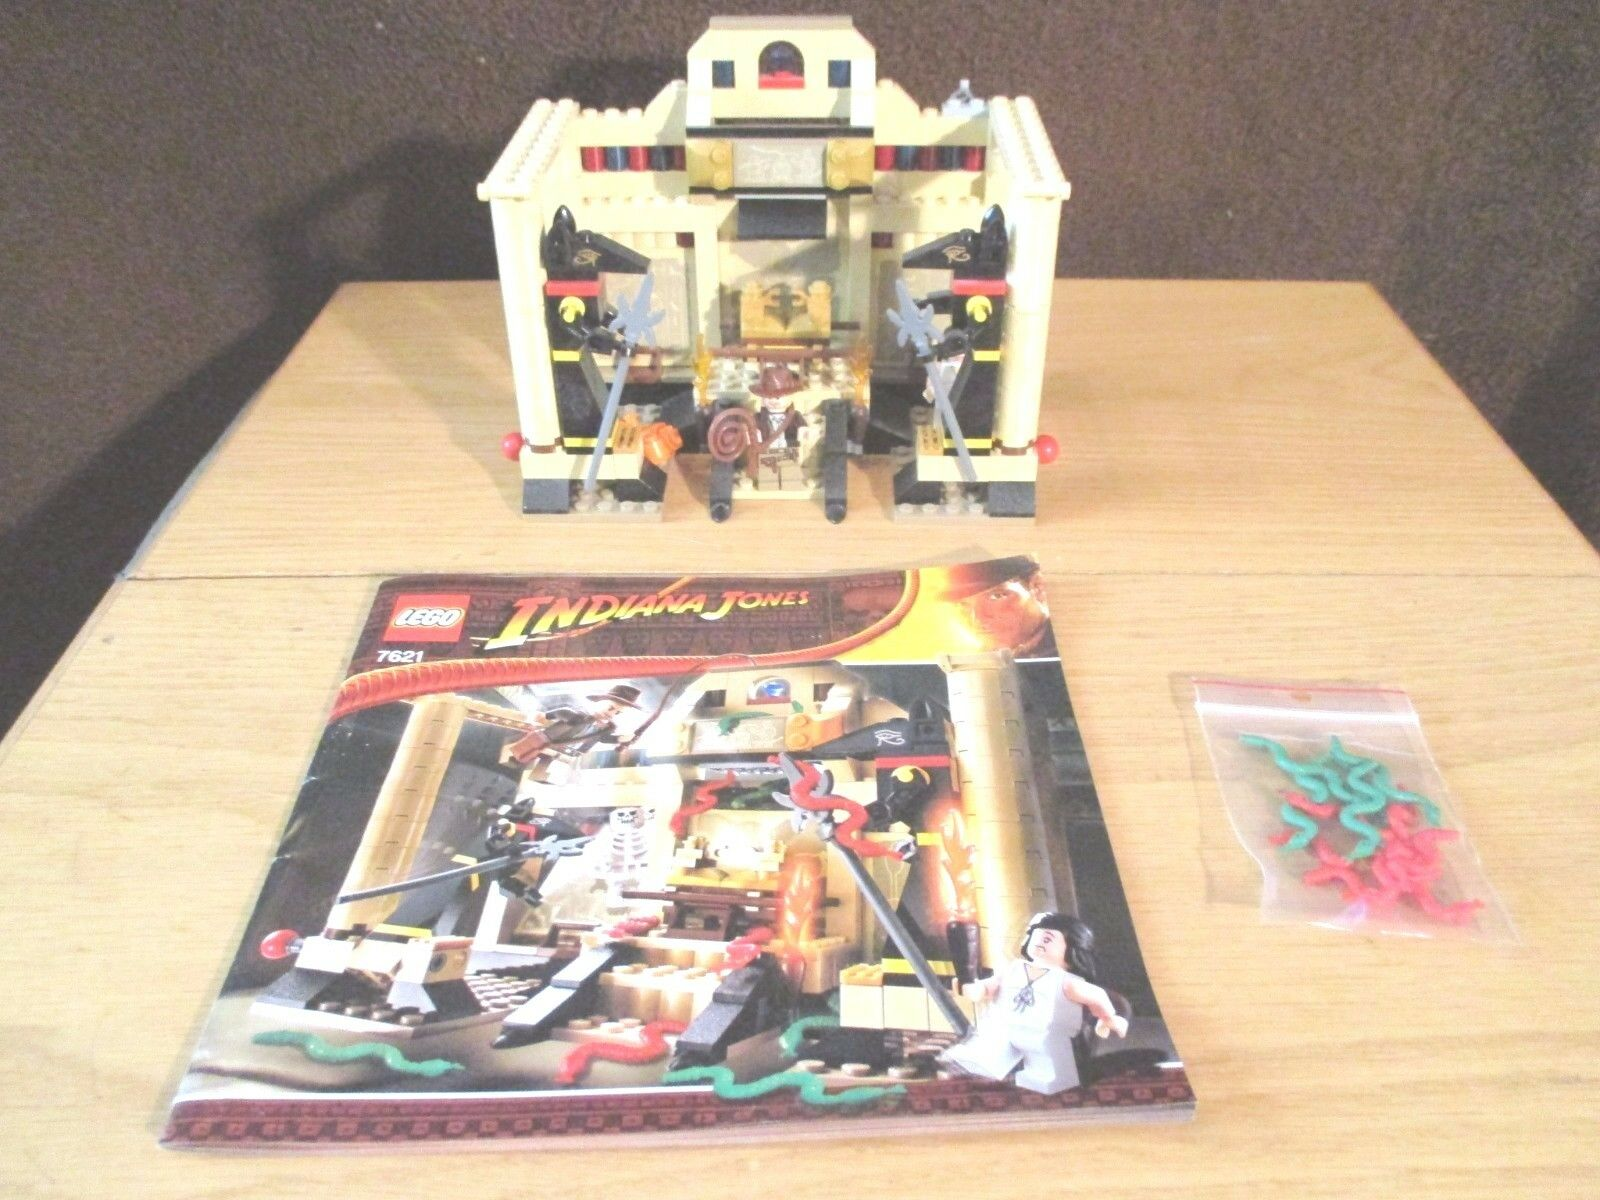 Lego - 7621 Indianer Jones - Das verlorene Grab